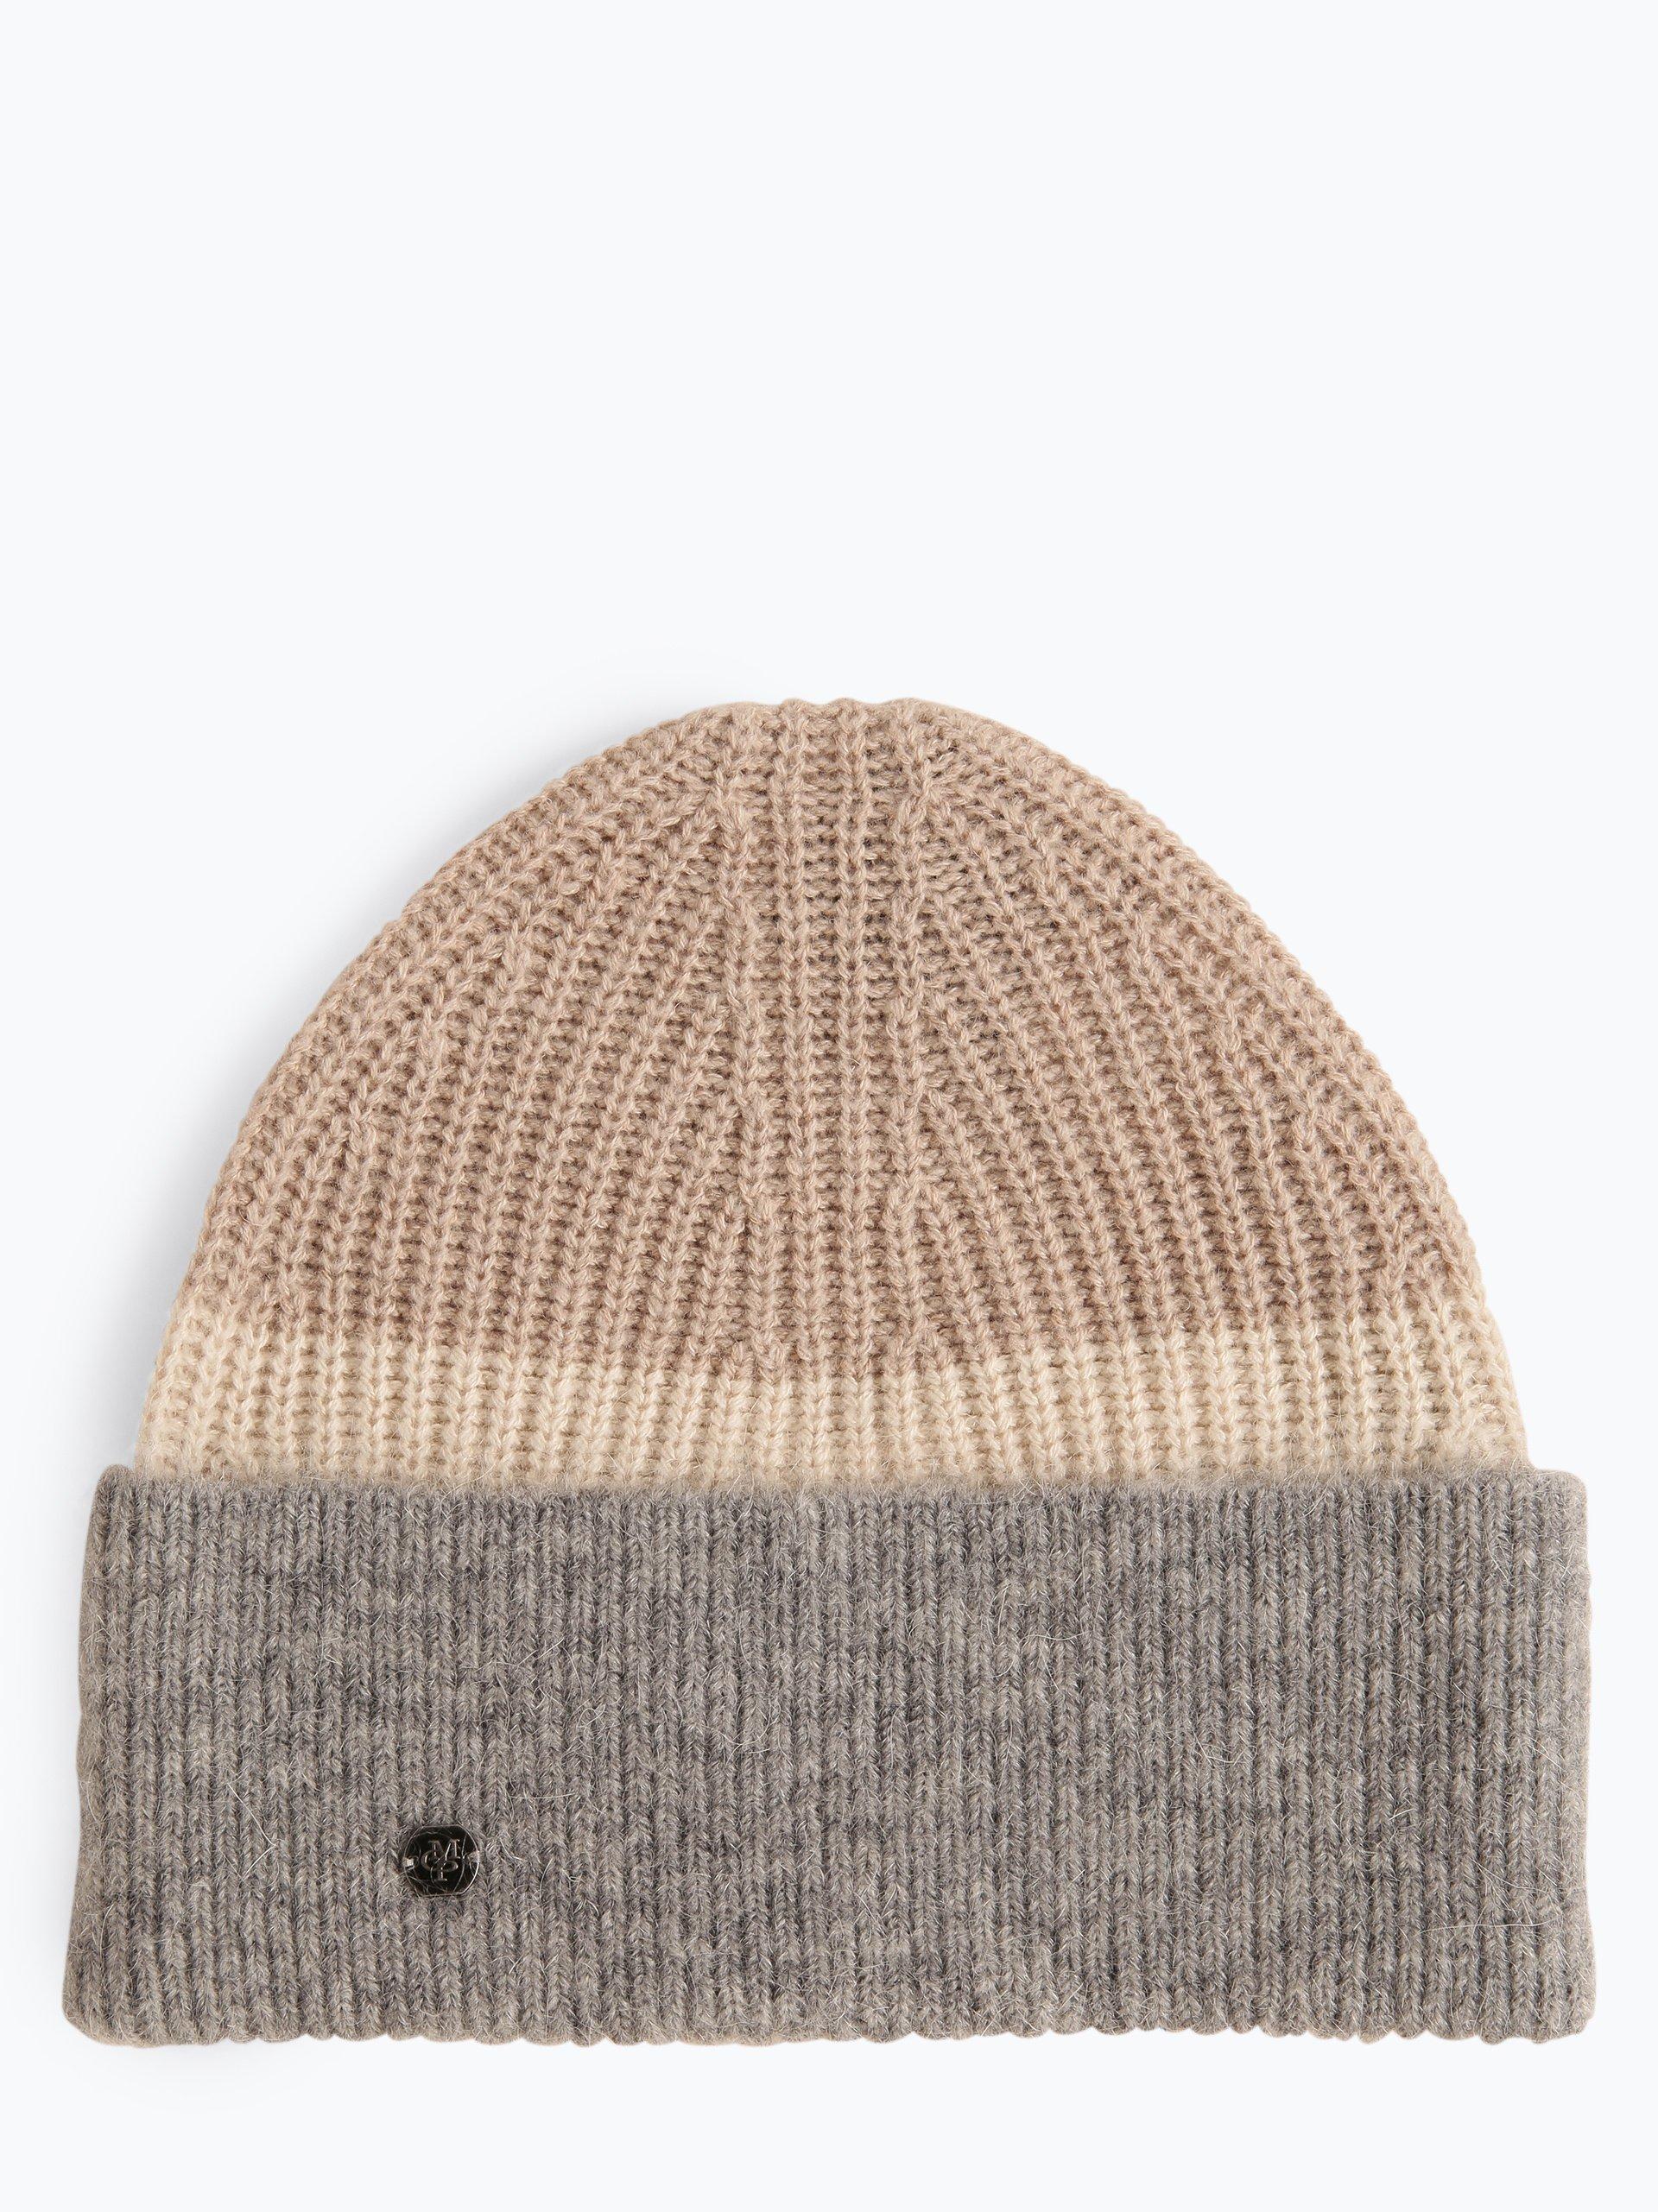 Marc O\'Polo Damen Mütze mit Mohair-Anteil